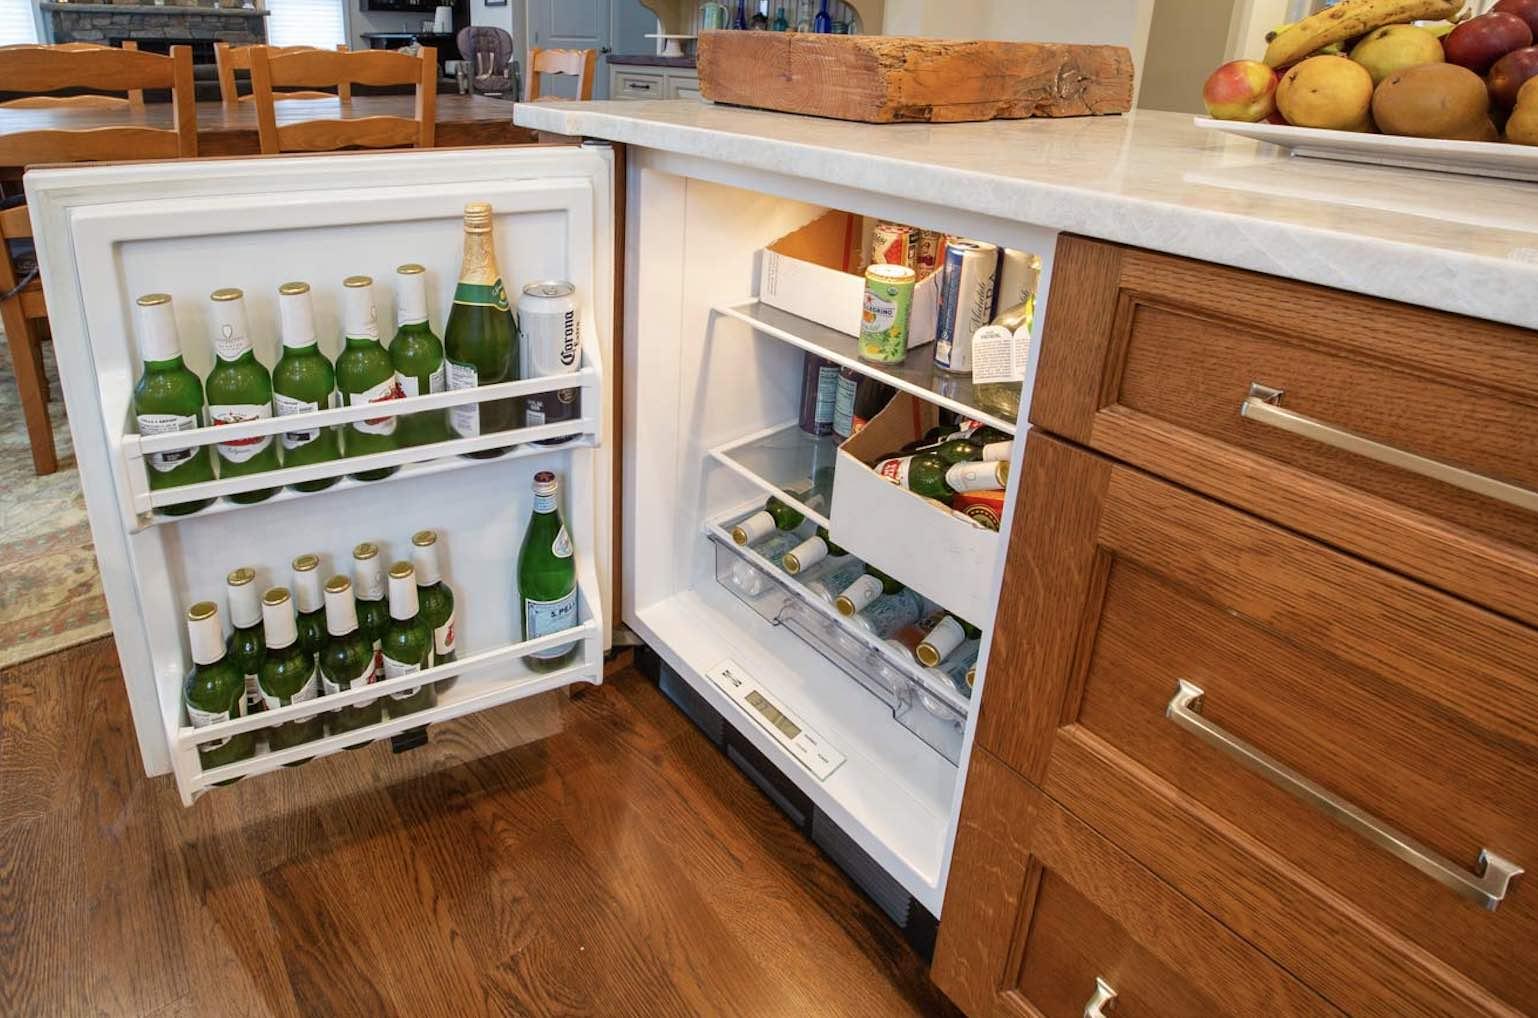 appliance-sizes-undercounter-beverage-cooler